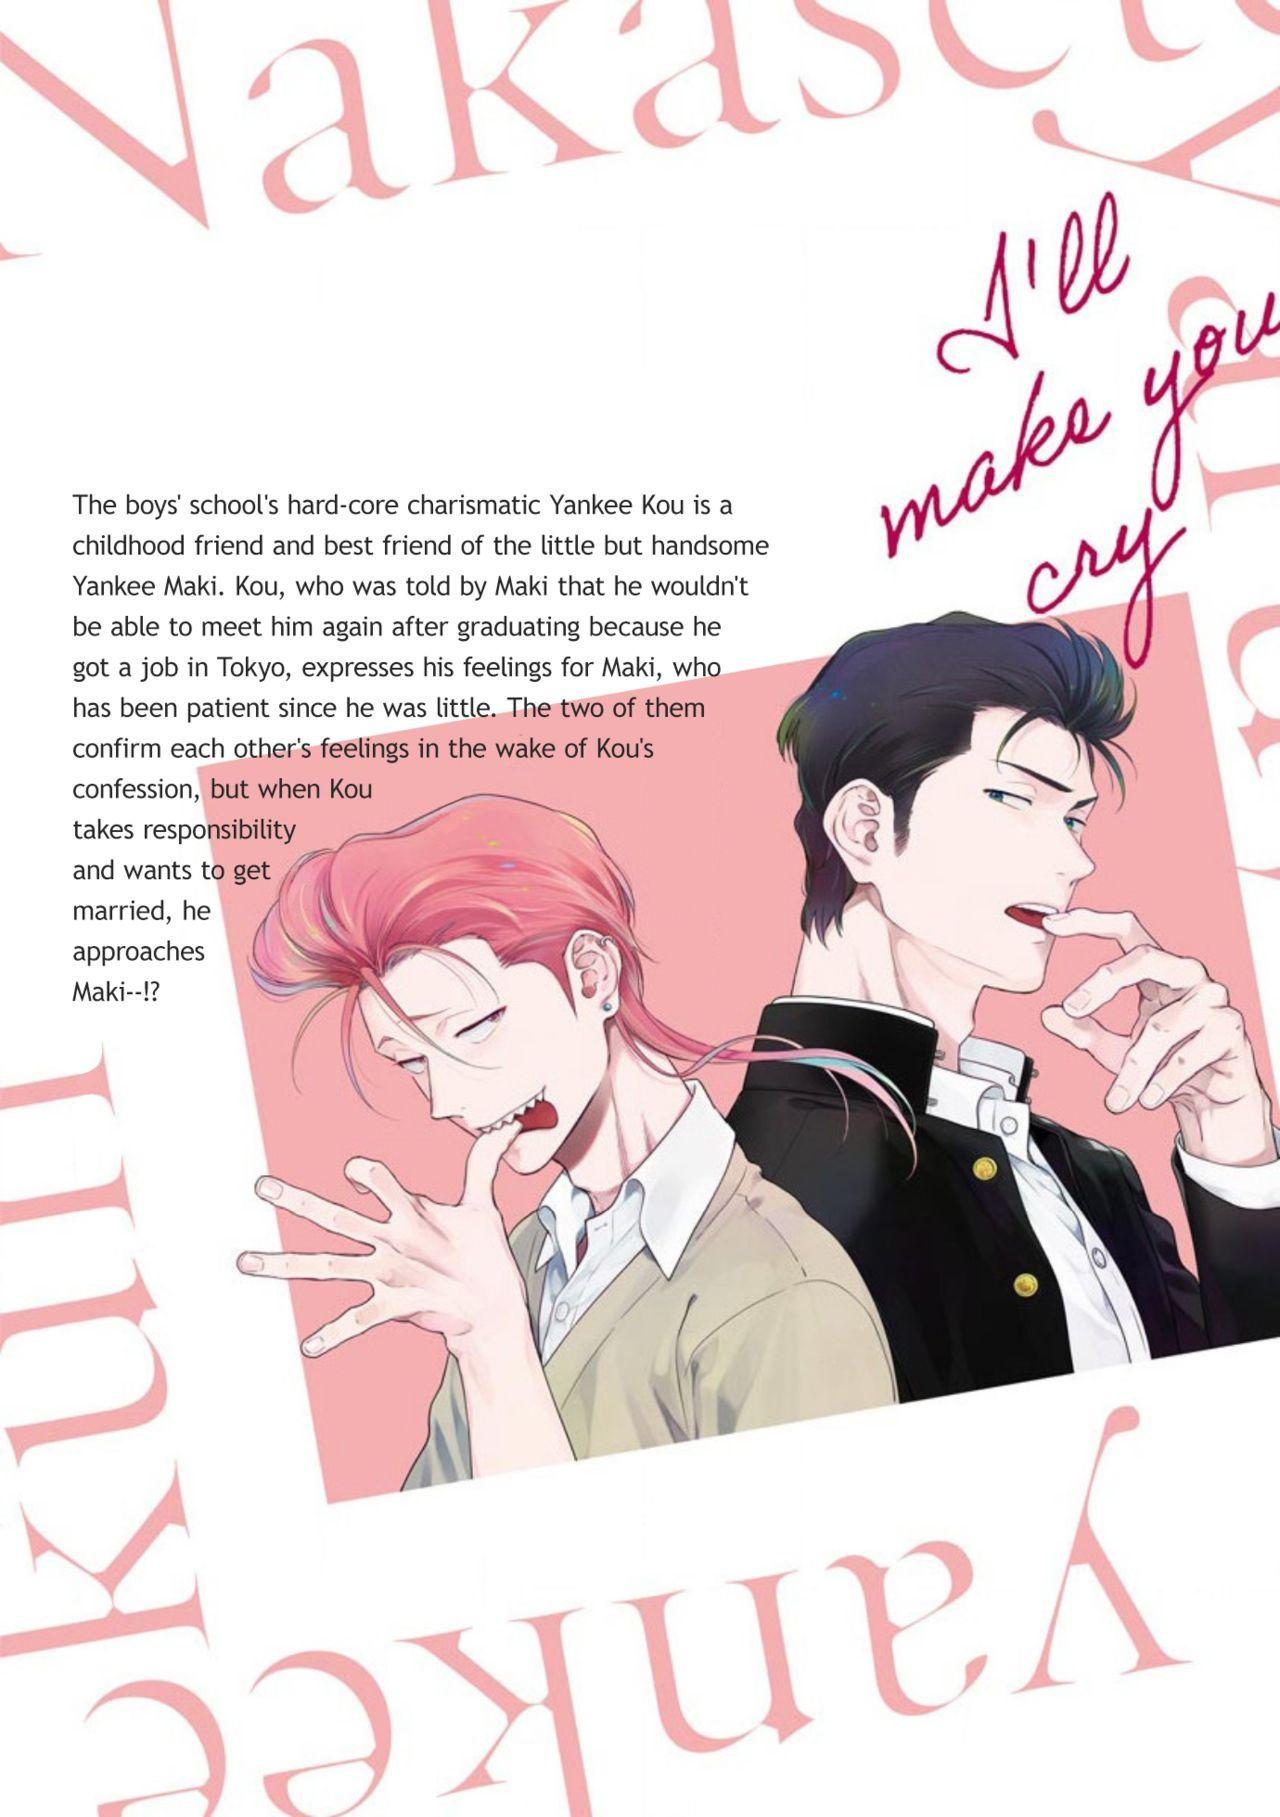 [Hiiragi Nozomu] Nakasete Yaru yo Yankee-kun   I'll Make You Cry Ch. 1-5 + Extras [English] [Digital] 204